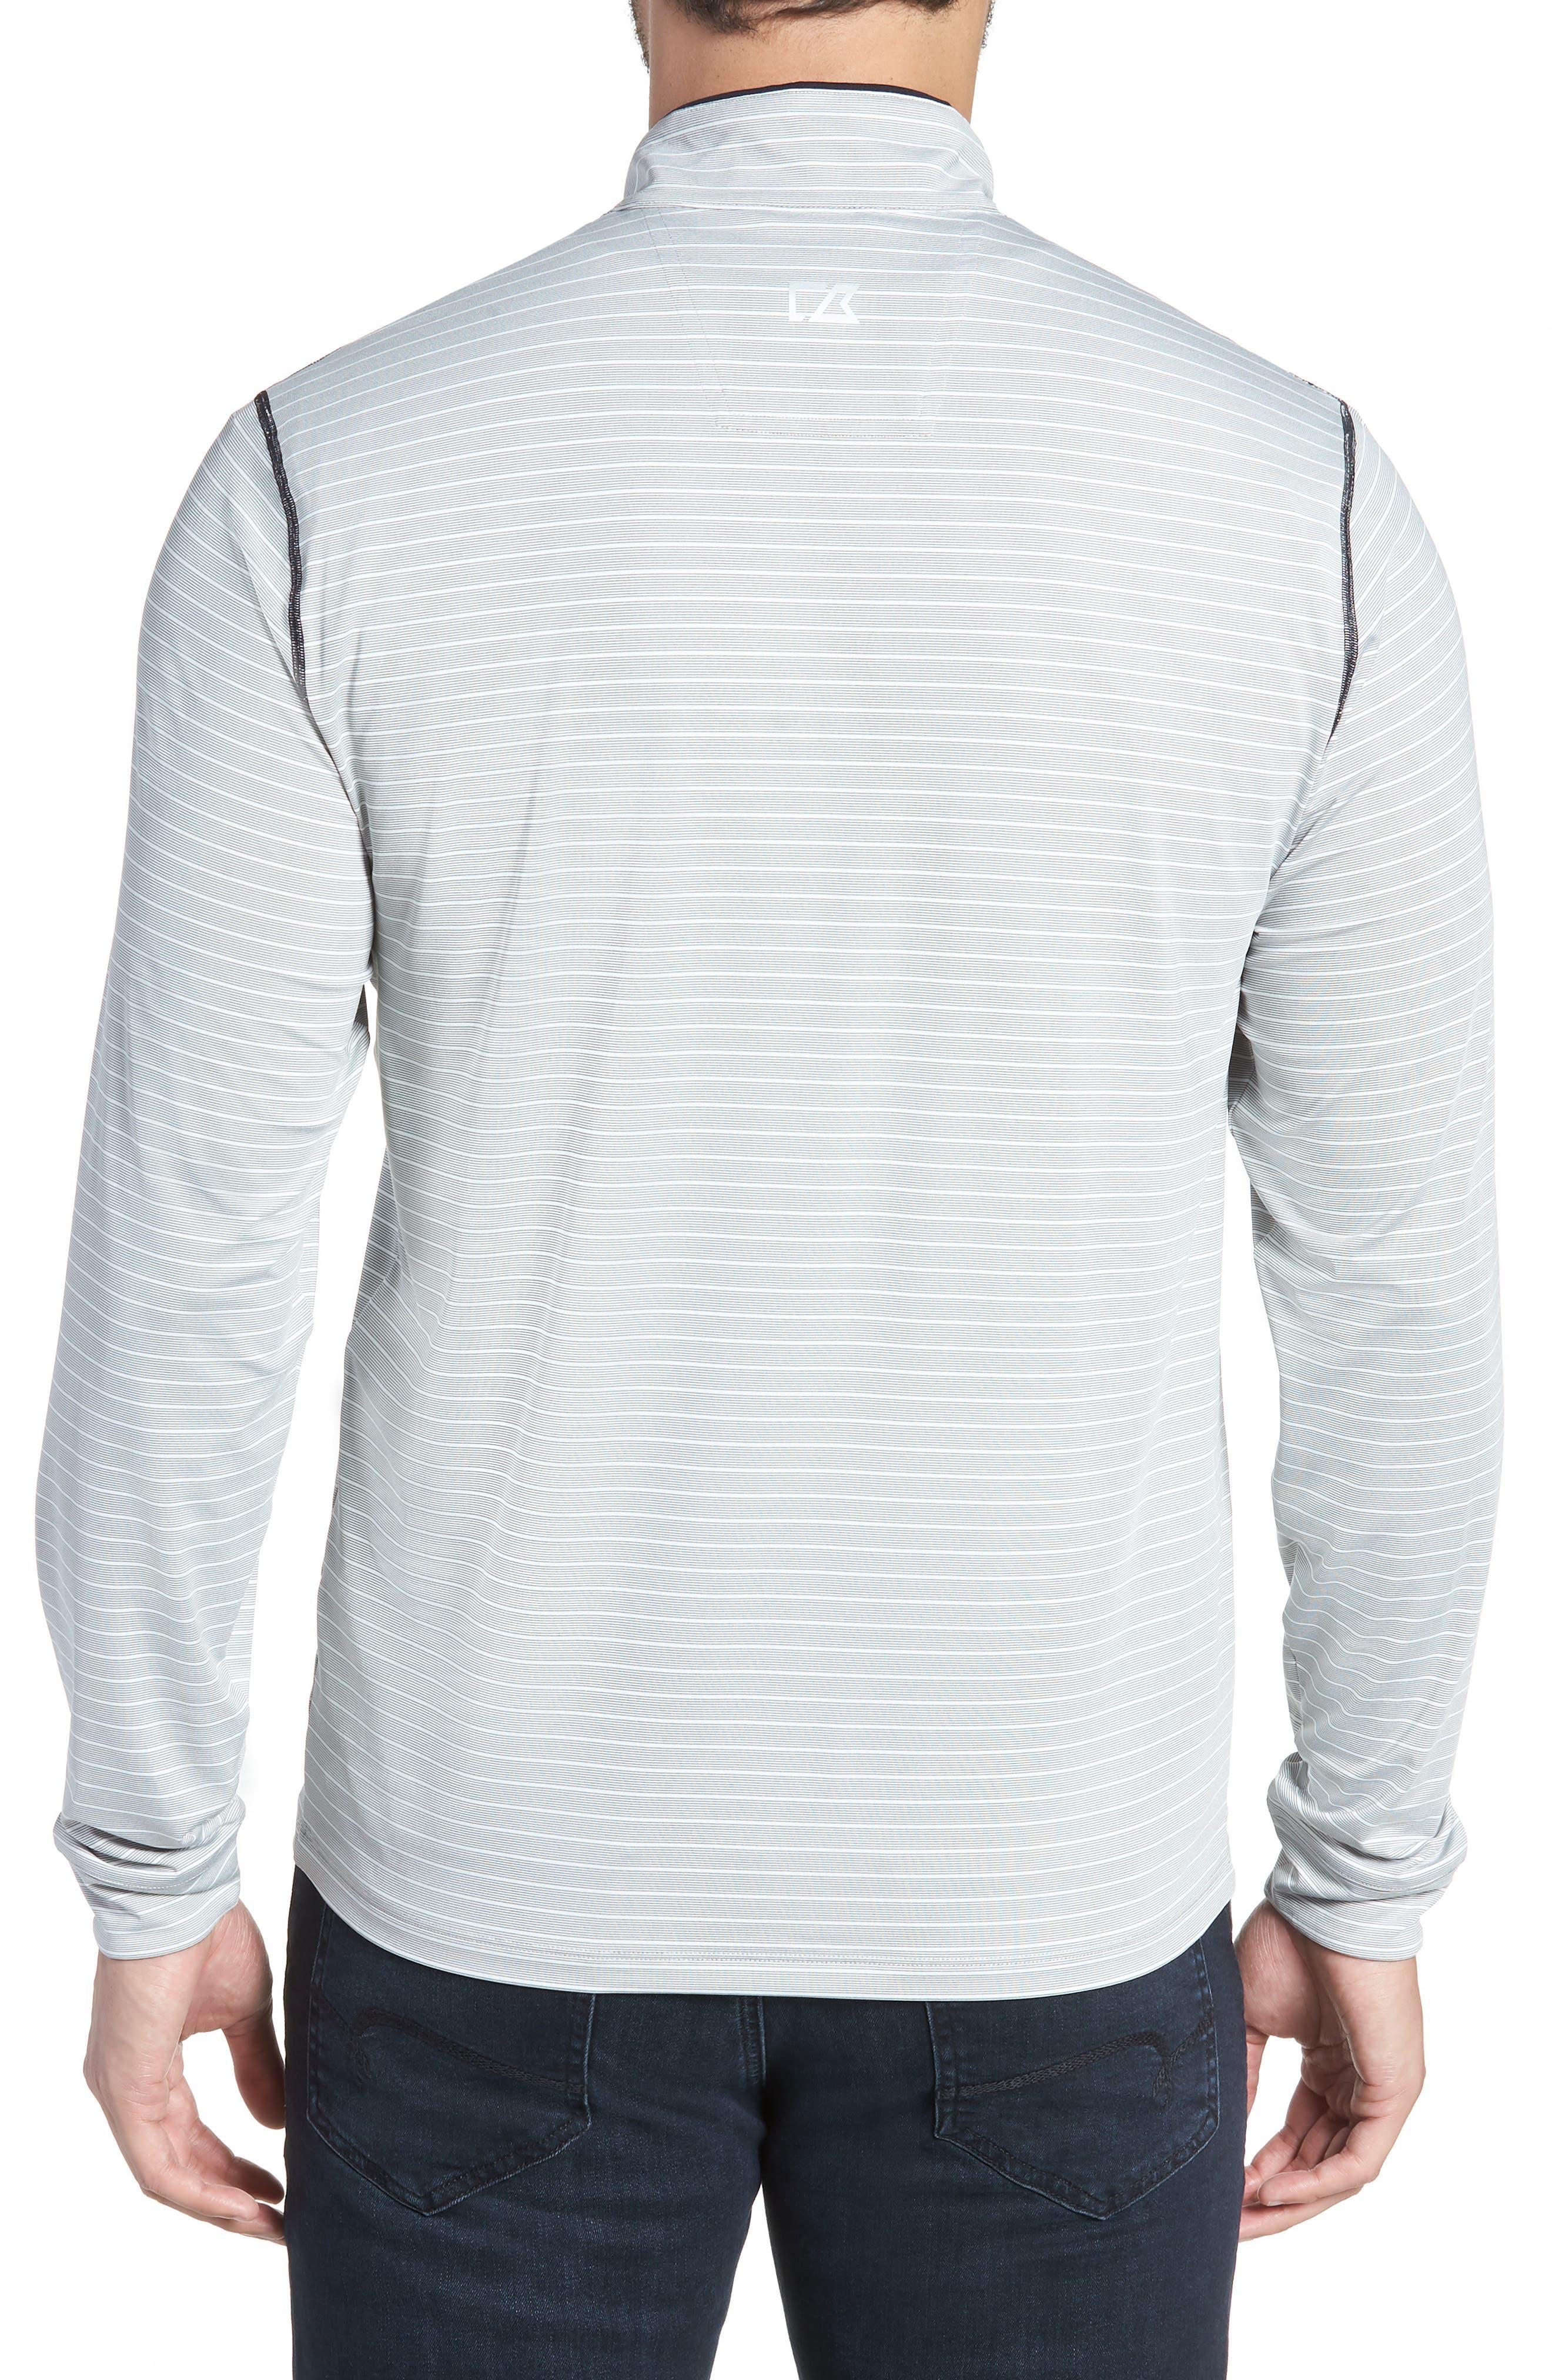 Meridian - Cleveland Browns Regular Fit Half Zip Pullover,                             Alternate thumbnail 2, color,                             BLACK